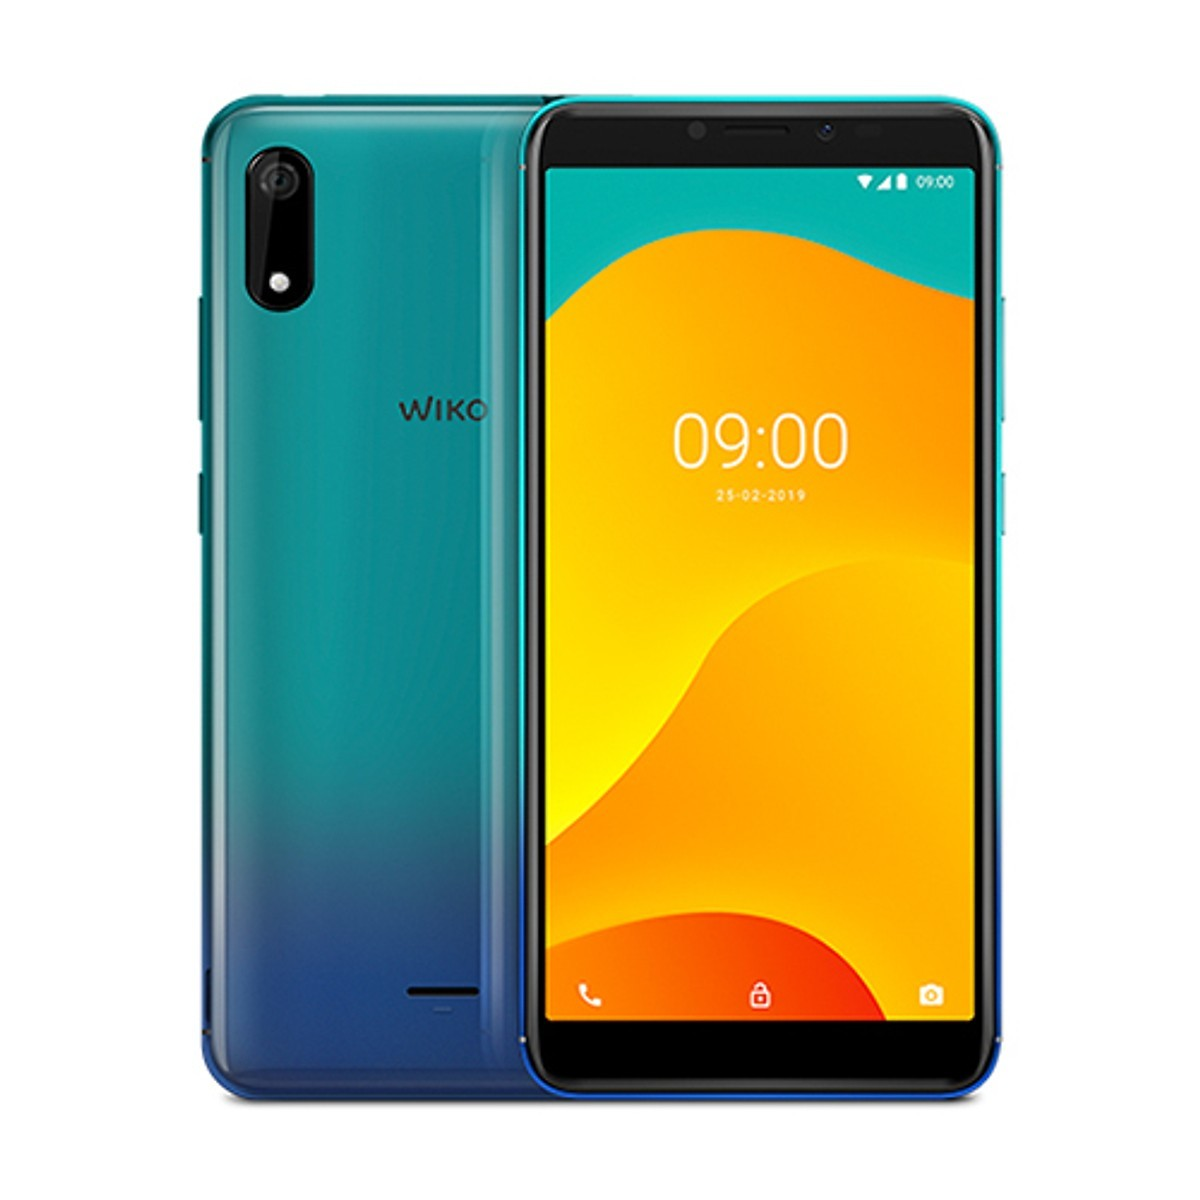 Điện thoại Wiko Sunny 4 Plus - 1GB RAM, 16GB, 5.45 inch